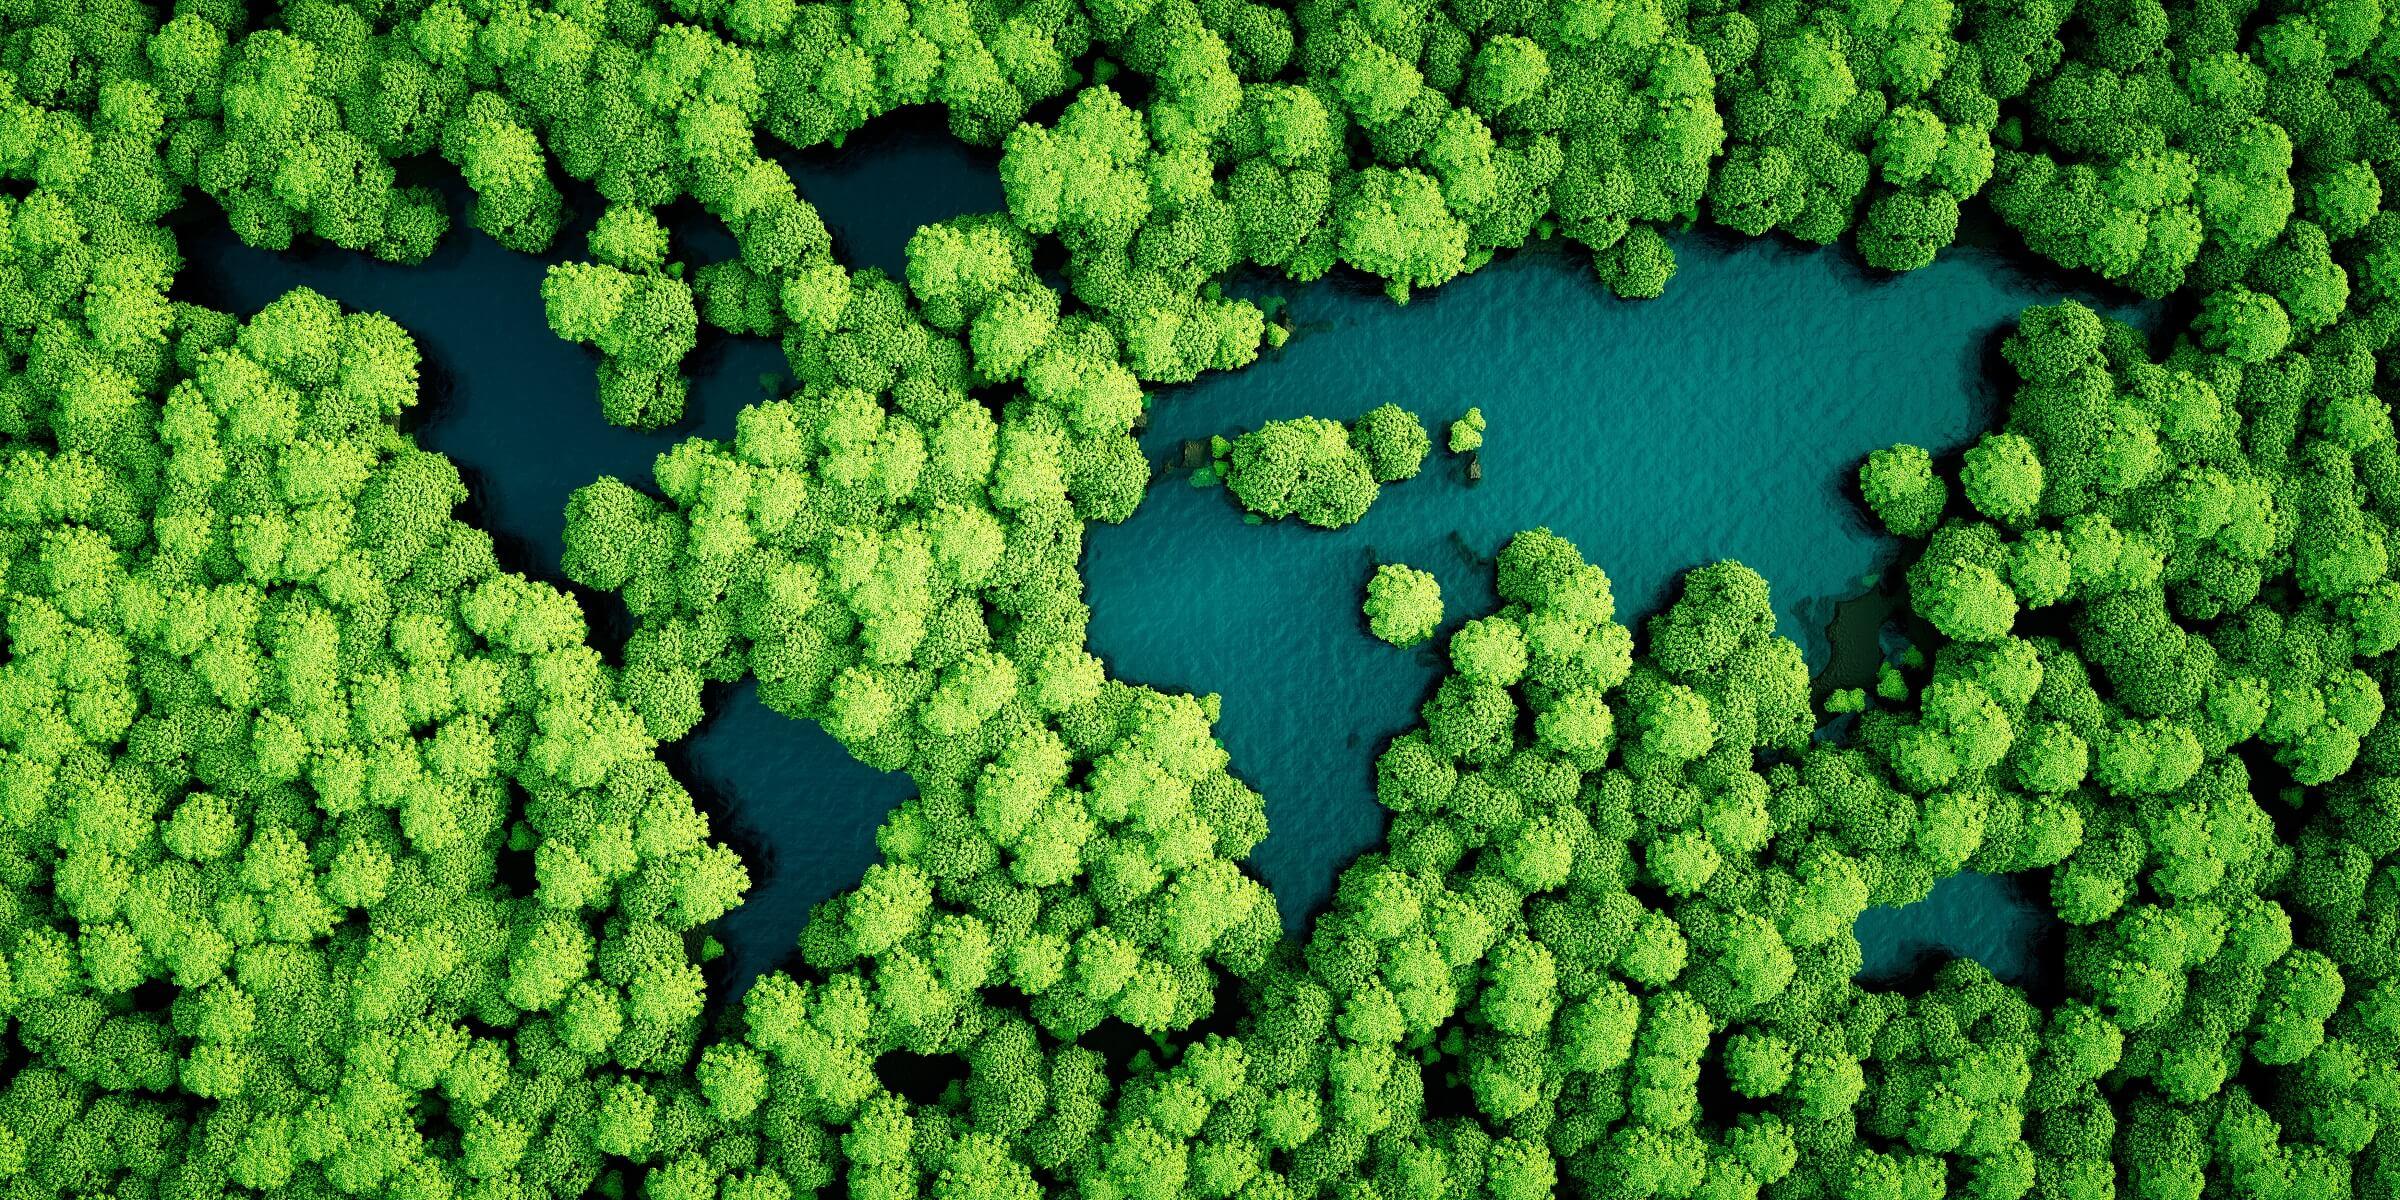 Umweltbewusstes reisen